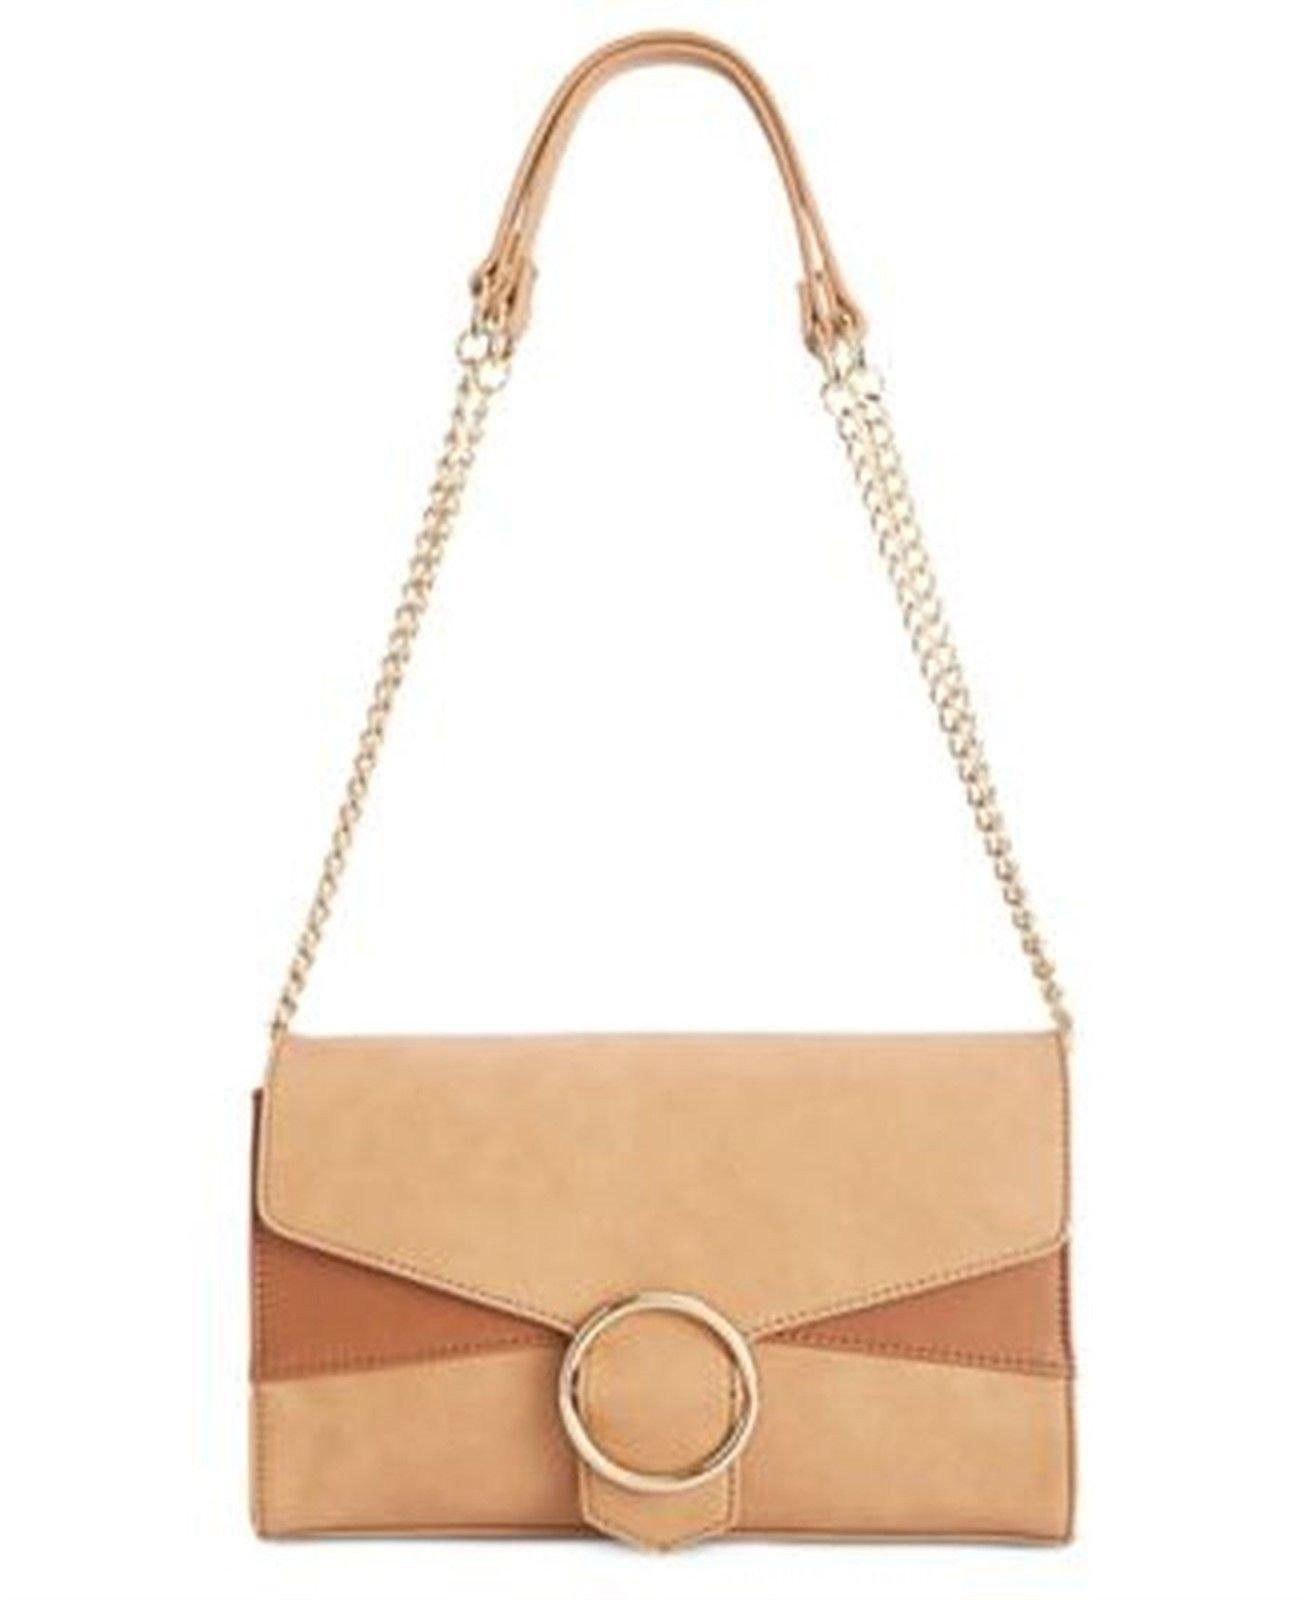 9eb95931da INC Womens Gwen Faux Leather Convertible Crossbody Handbag Tan Small